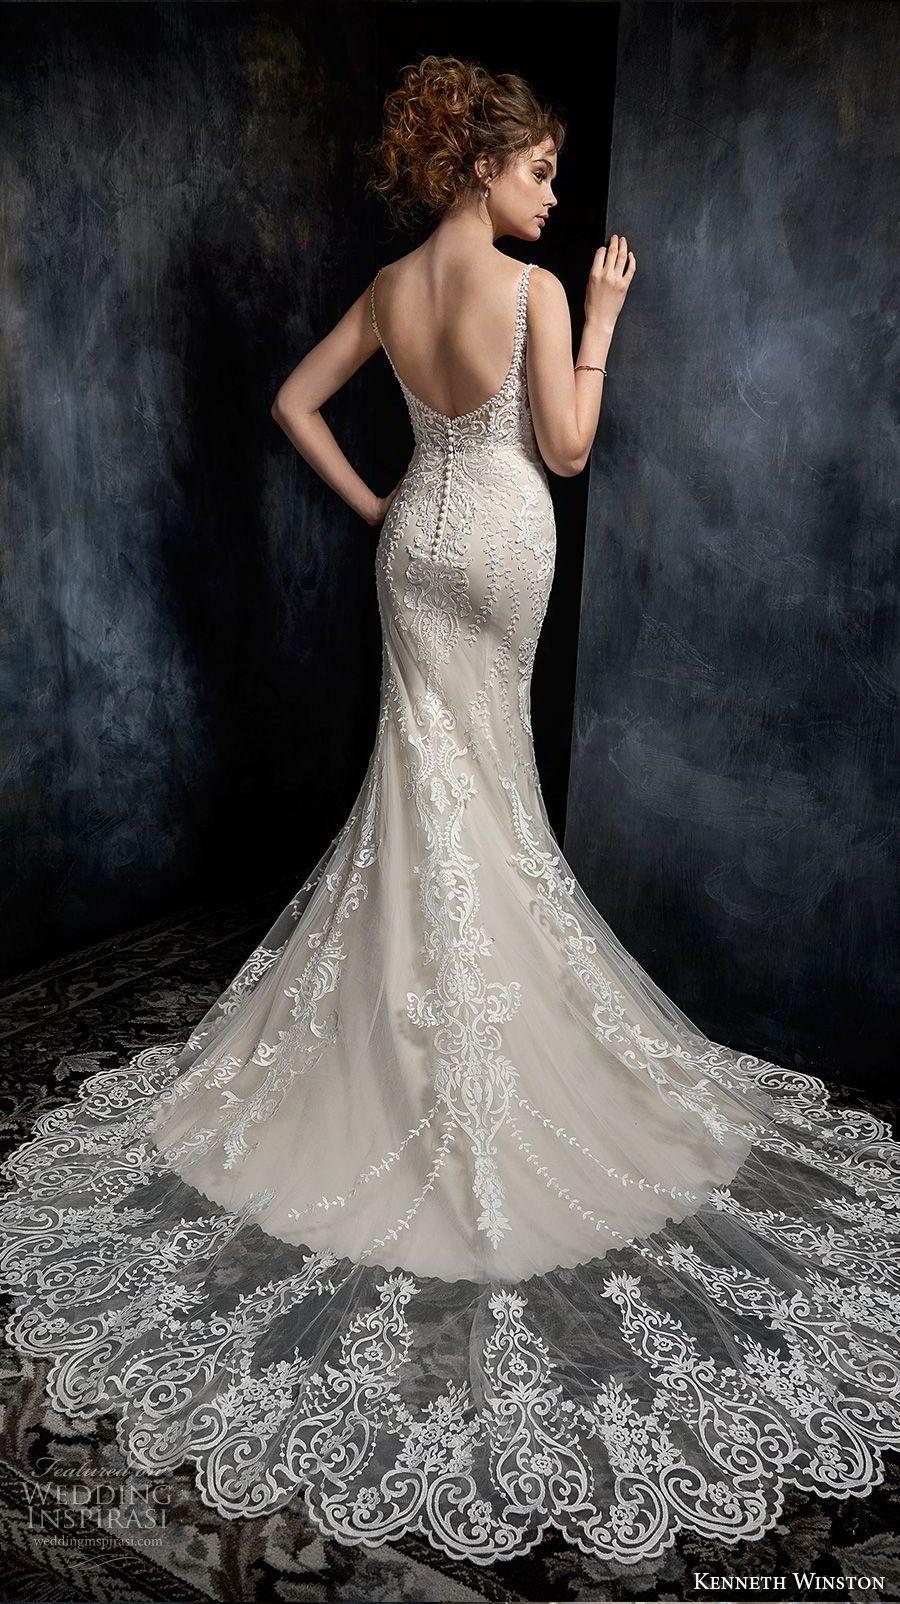 Kenneth Winston Fall 2017 Wedding Dresses   Designer